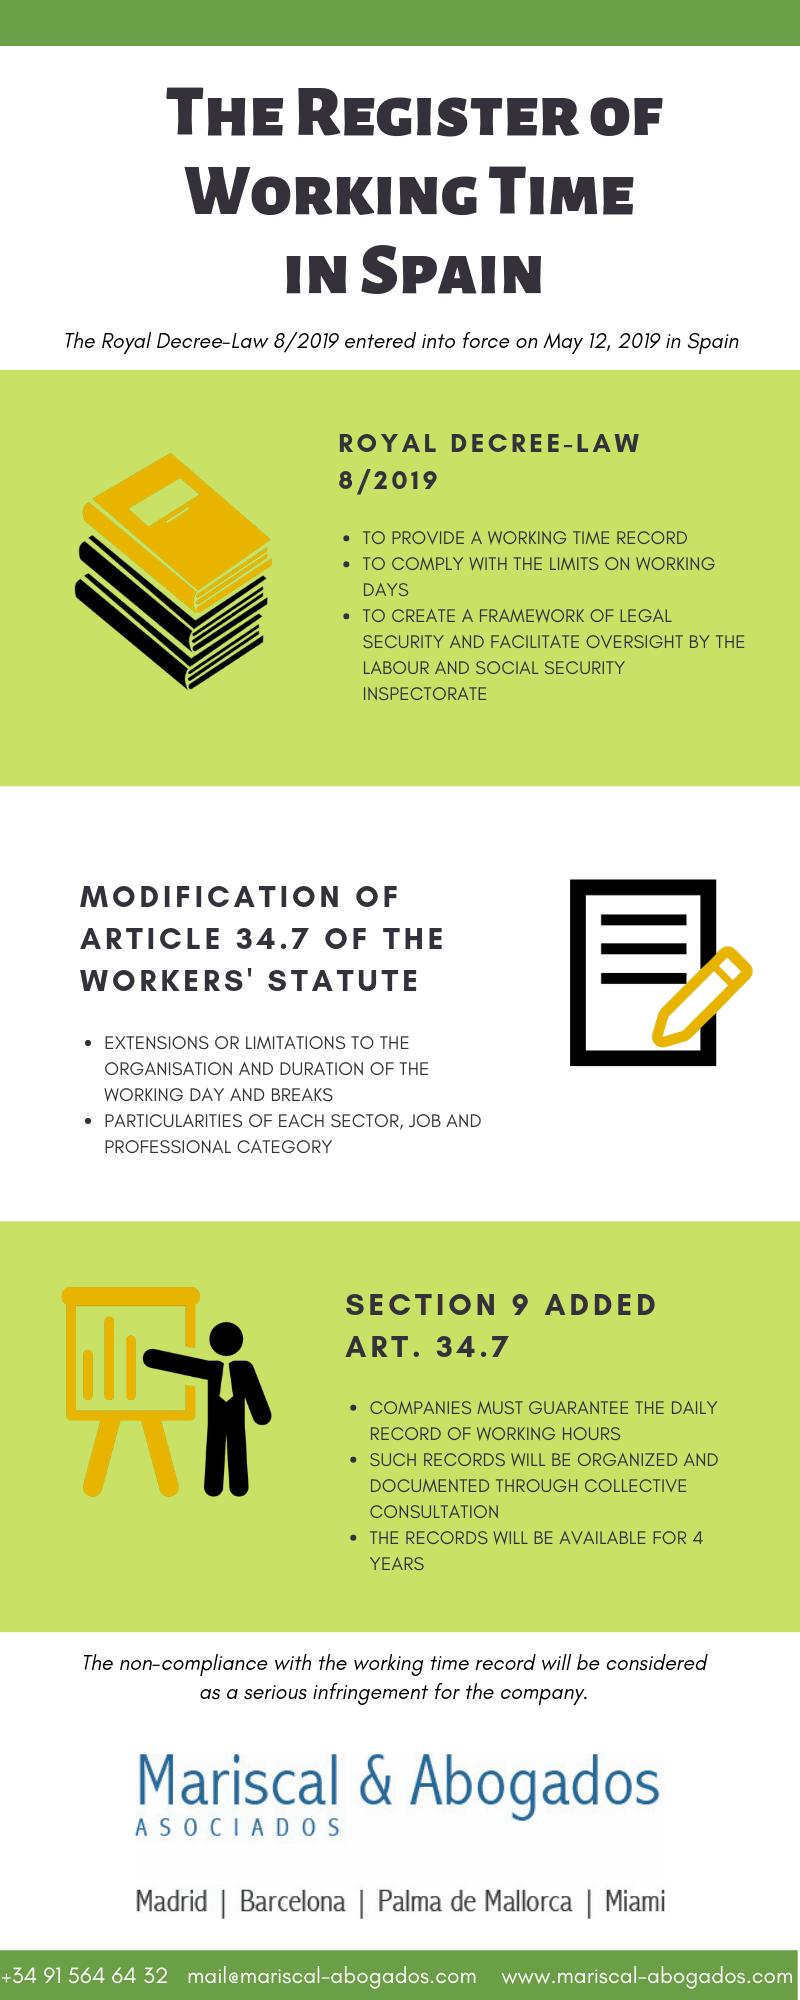 Desayuno 27_3 - The Register of Working Time in Spain (diapositiva 40 y artículo 23 2019)